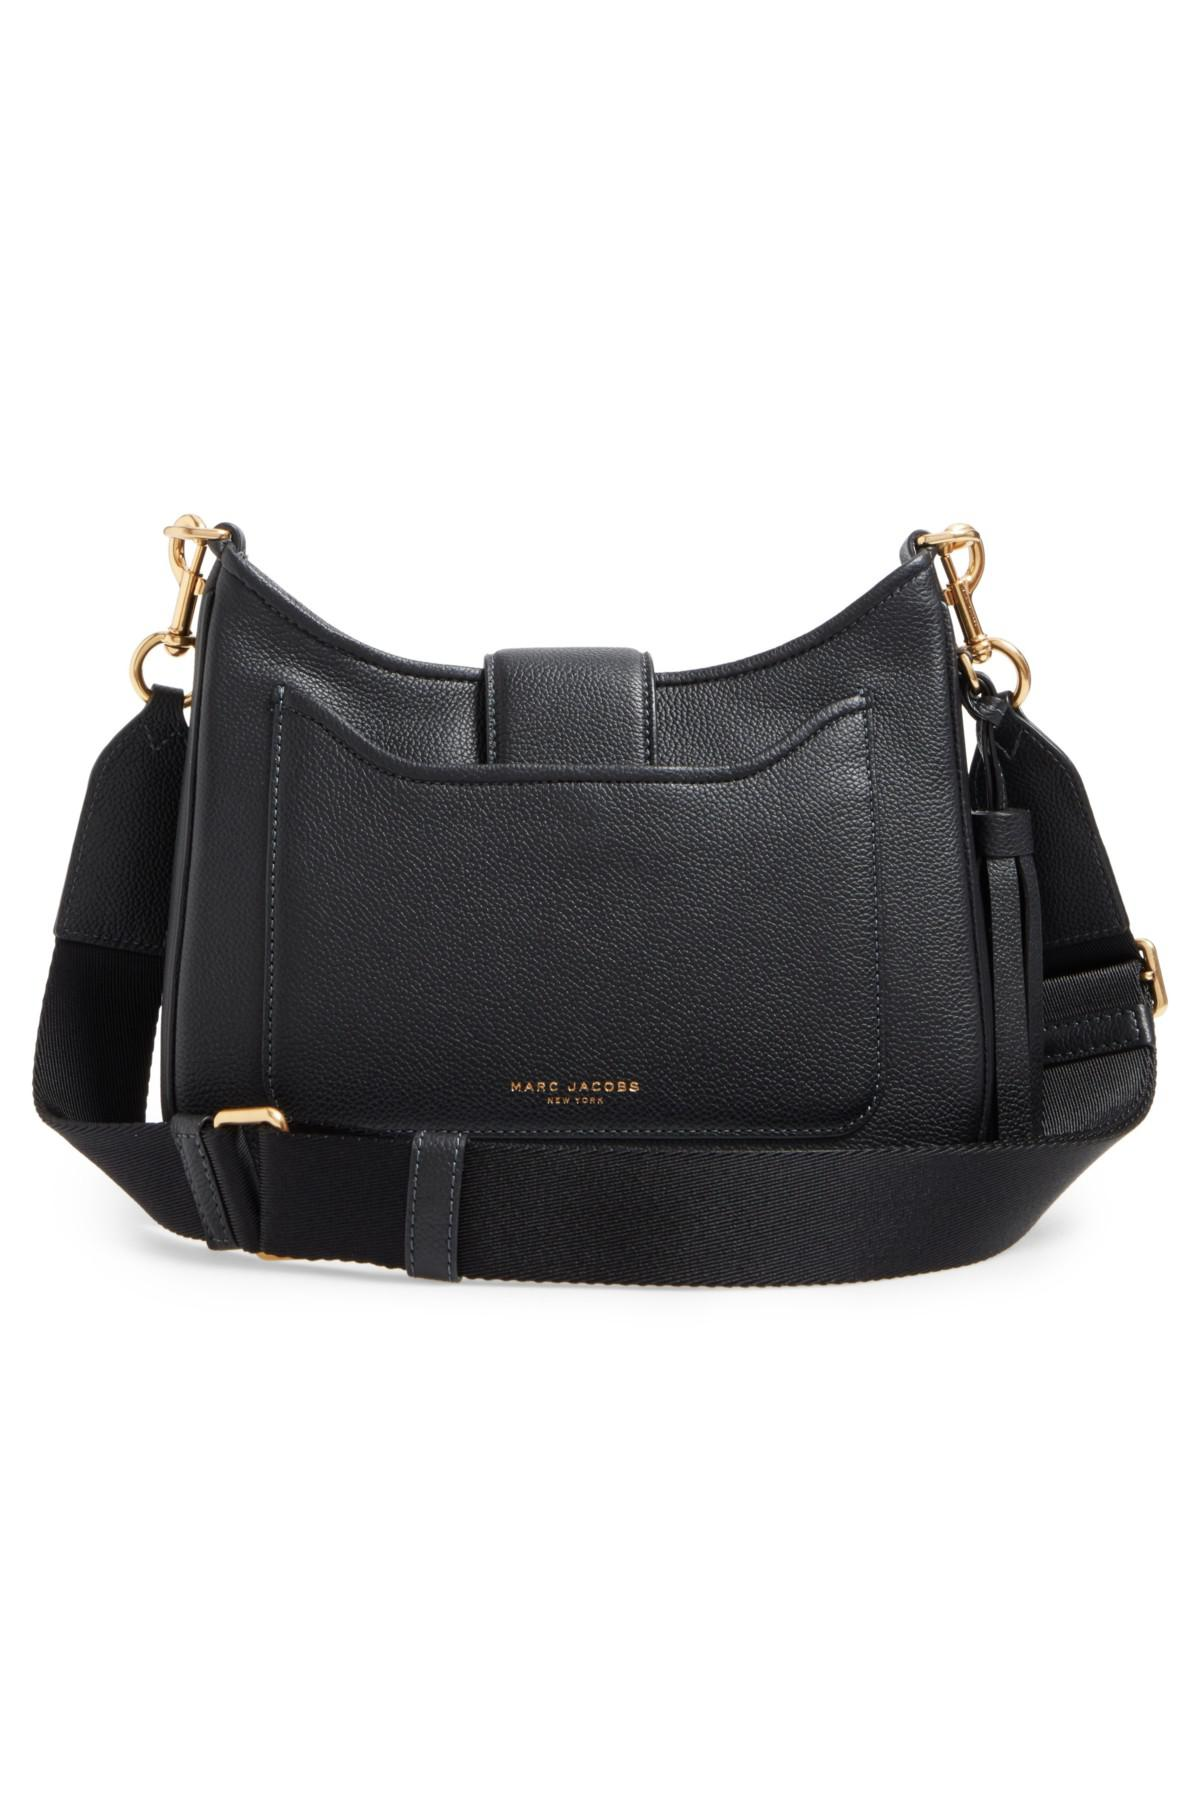 363adffd85ea Lyst - Marc Jacobs Interlock Small Leather Hobo Shoulder Bag in Black